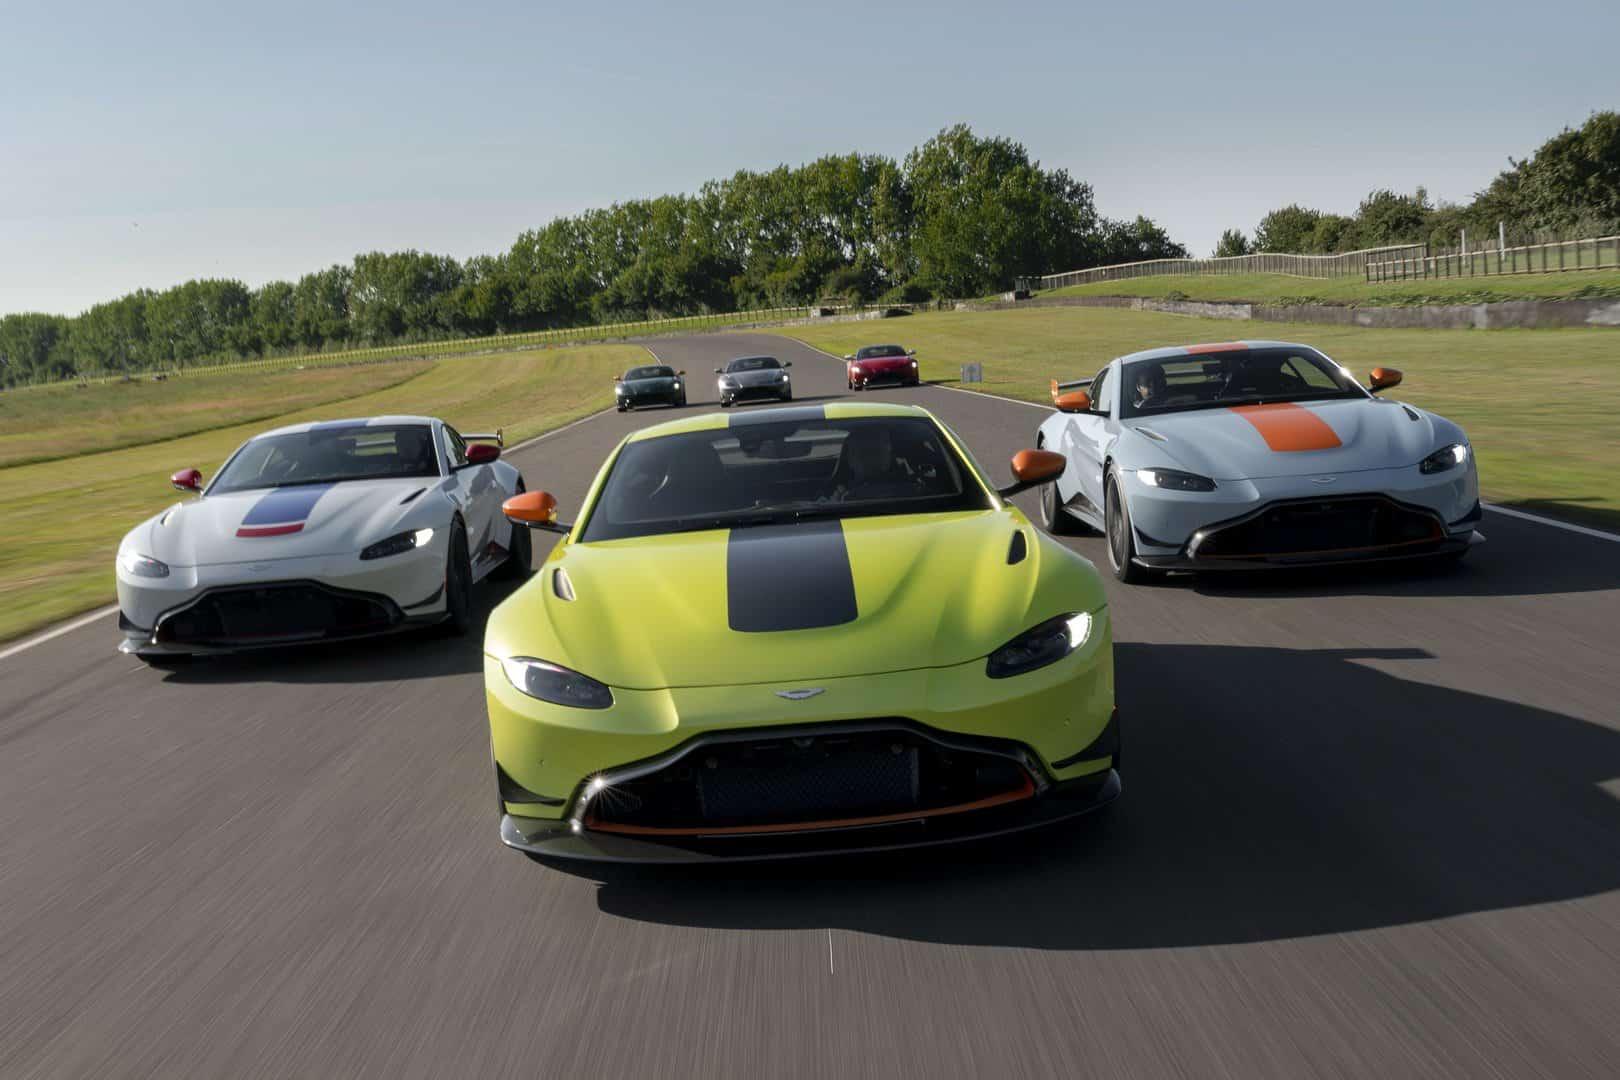 2019 aston martin vantage heritage racing editions 11